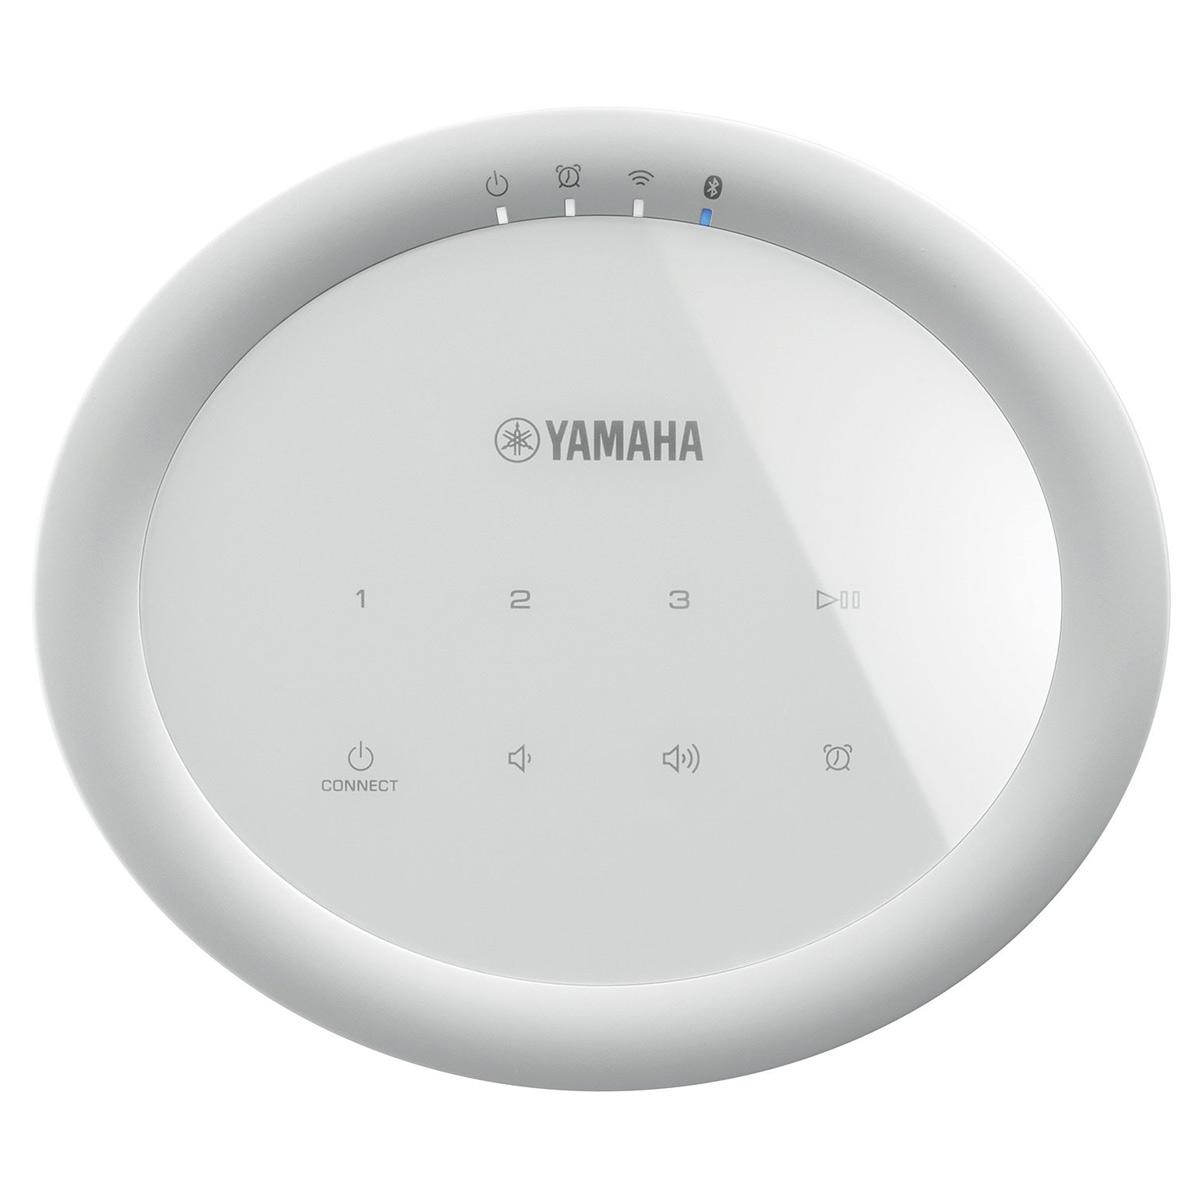 Yamaha-WX-021-MusicCast-20-Wireless-Speaker thumbnail 21